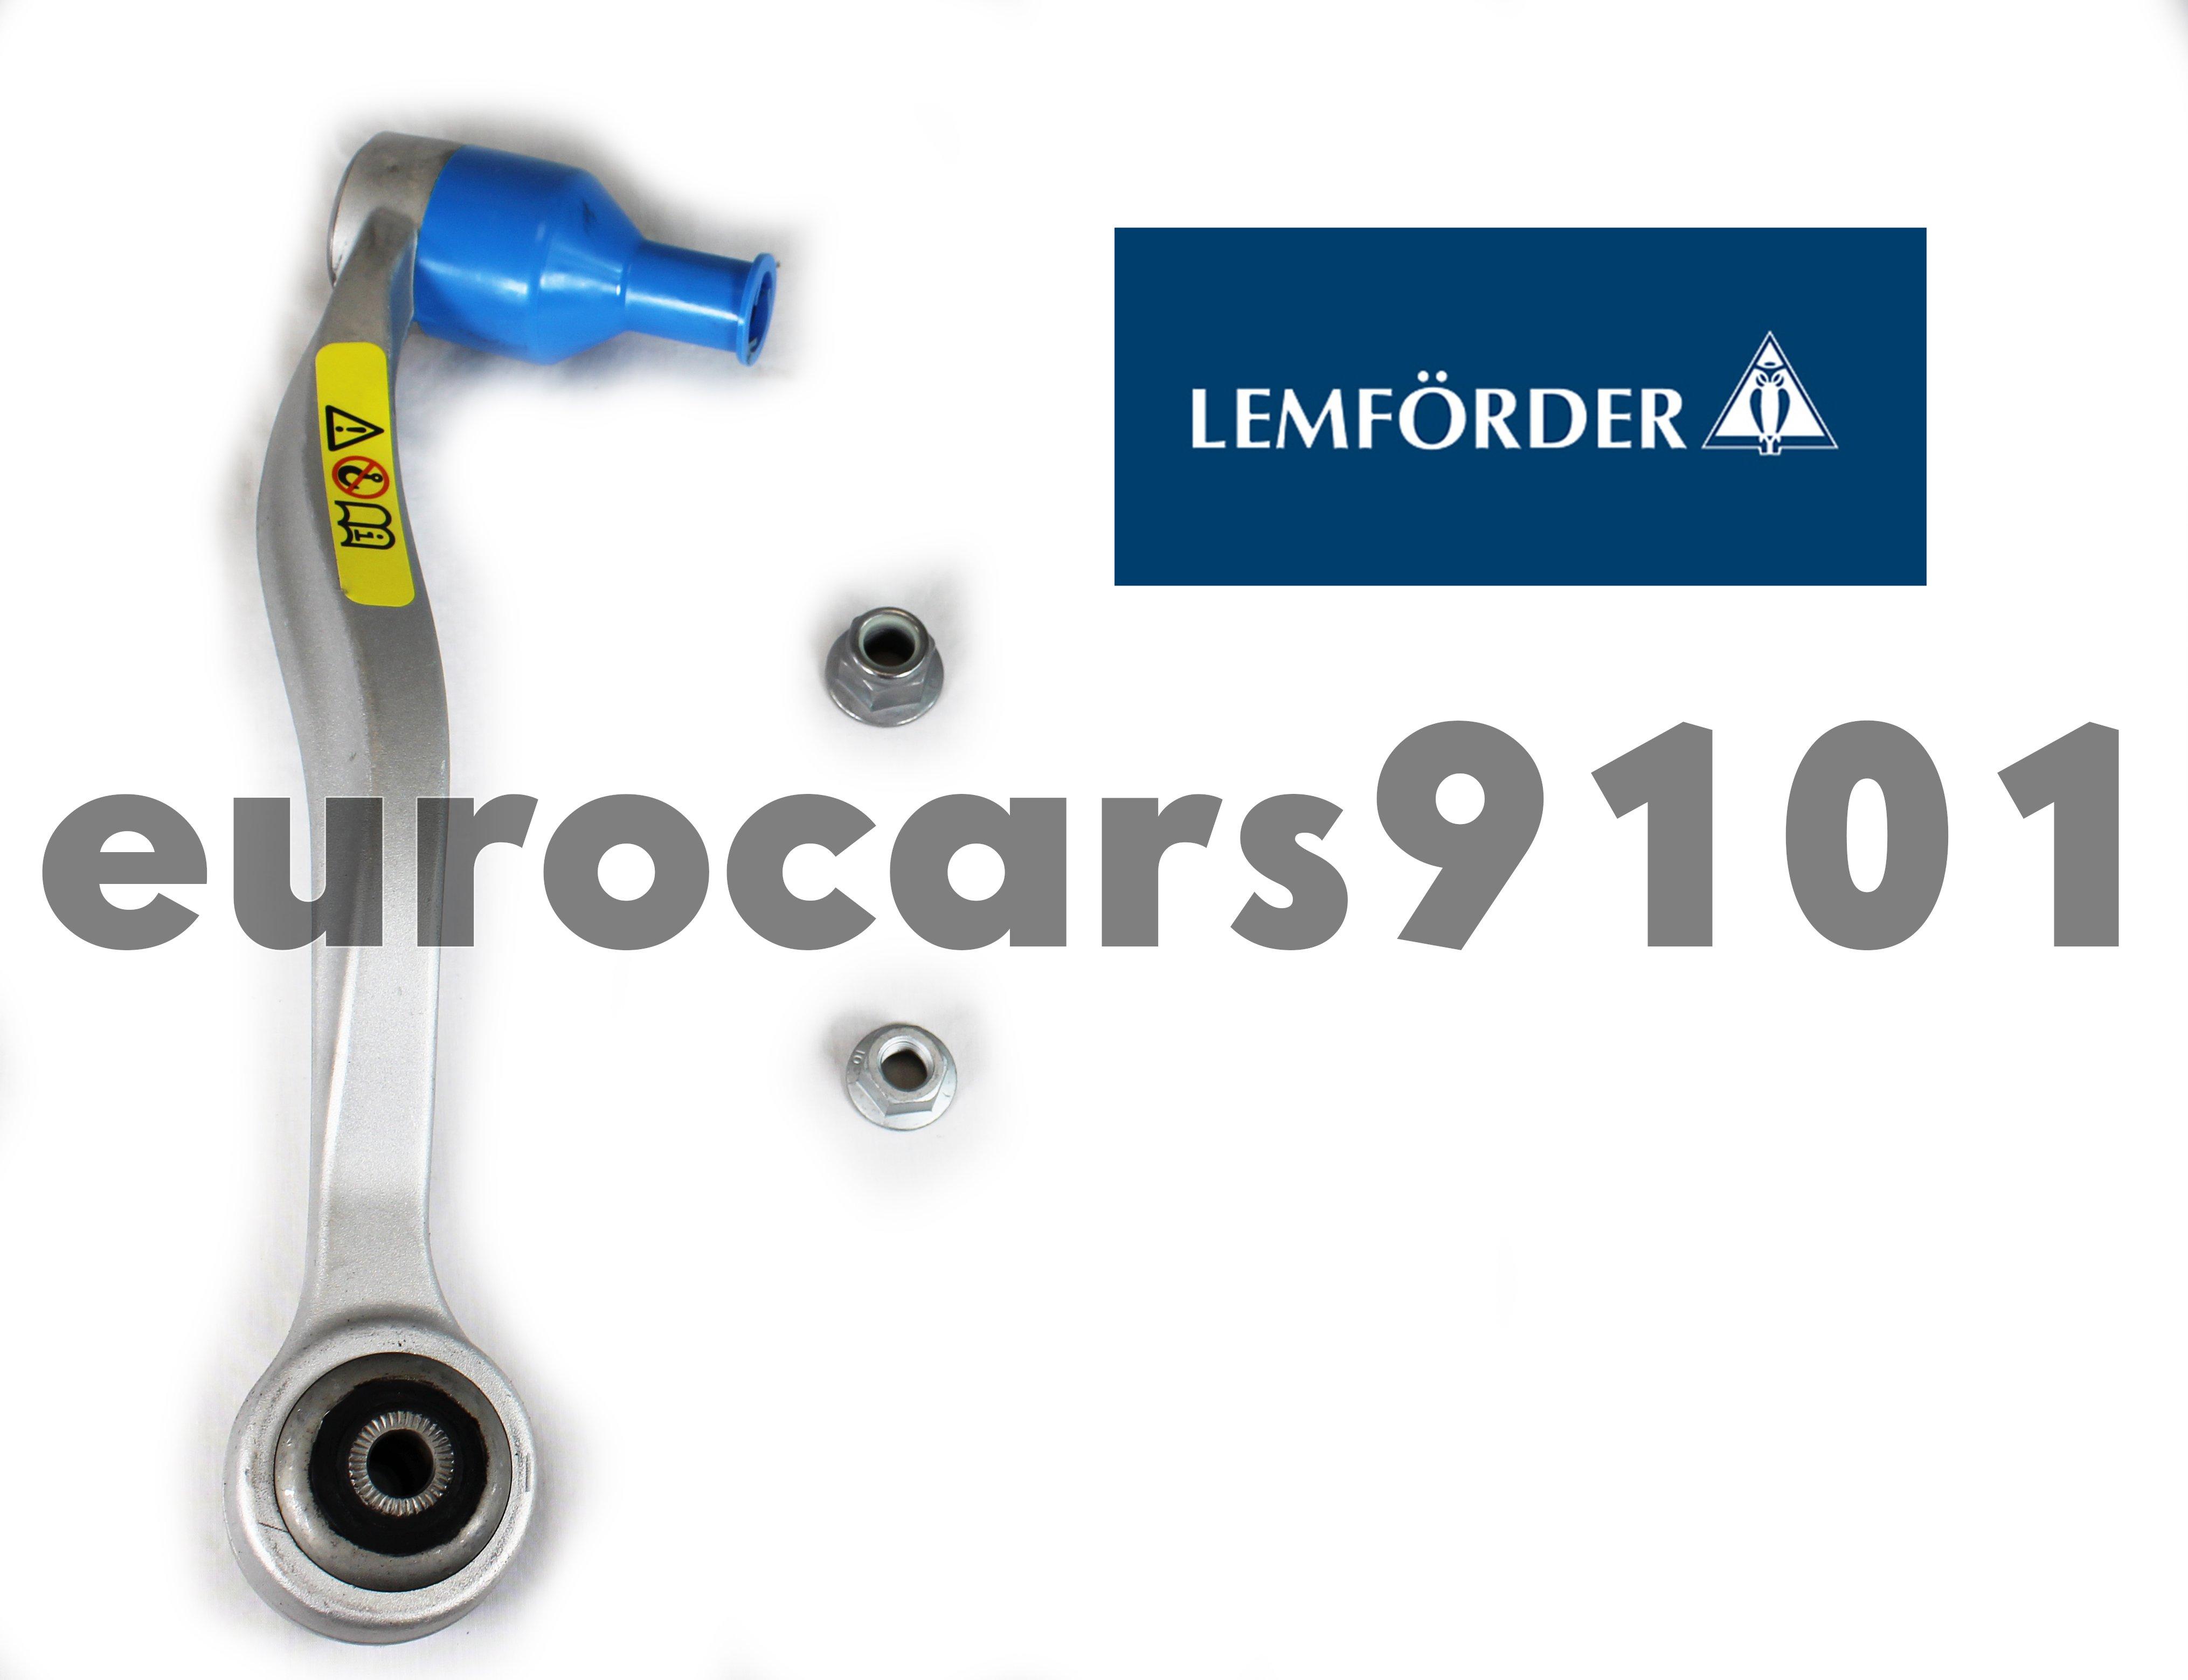 BMW M5 Lemforder Front Left Upper Suspension Control Arm 1930801 31121092609